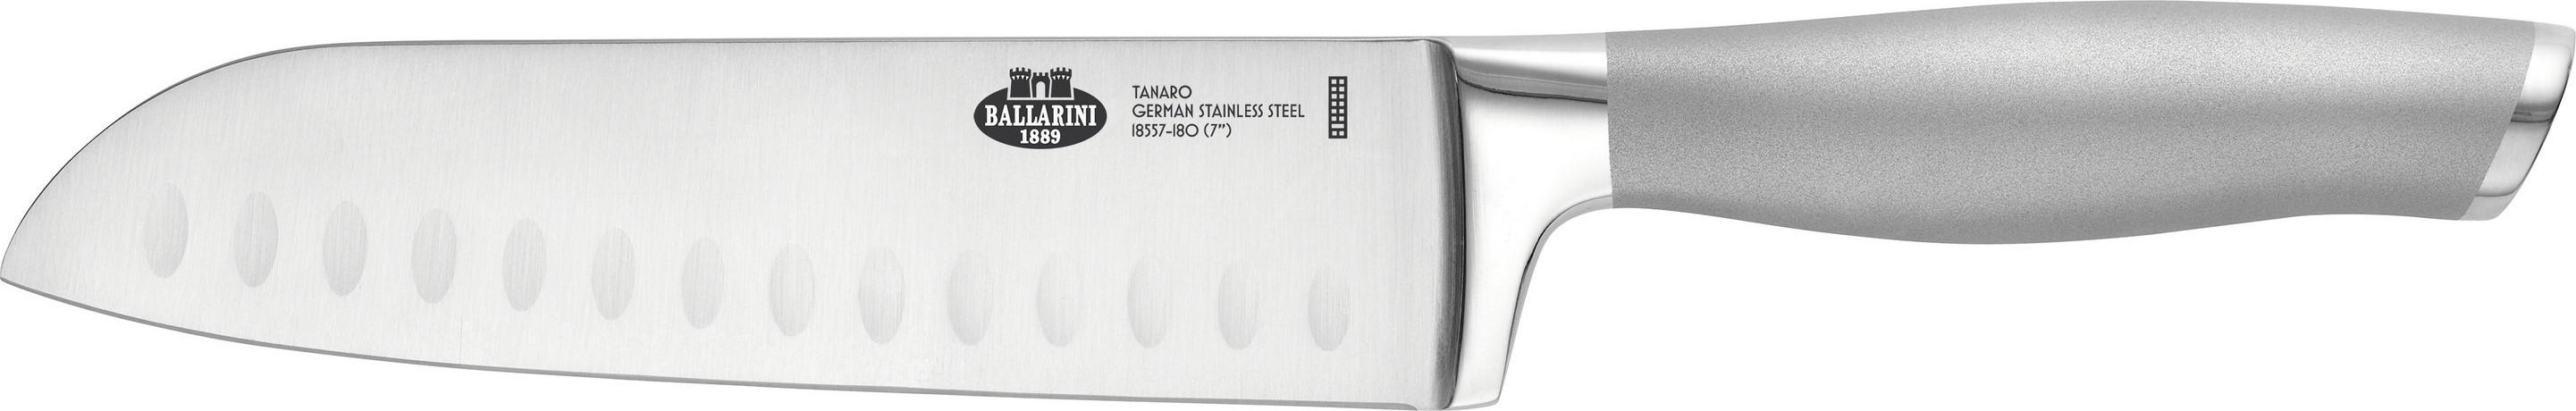 Buy the Ballarini Tanaro Santoku Knife online at smithsofloughton.com